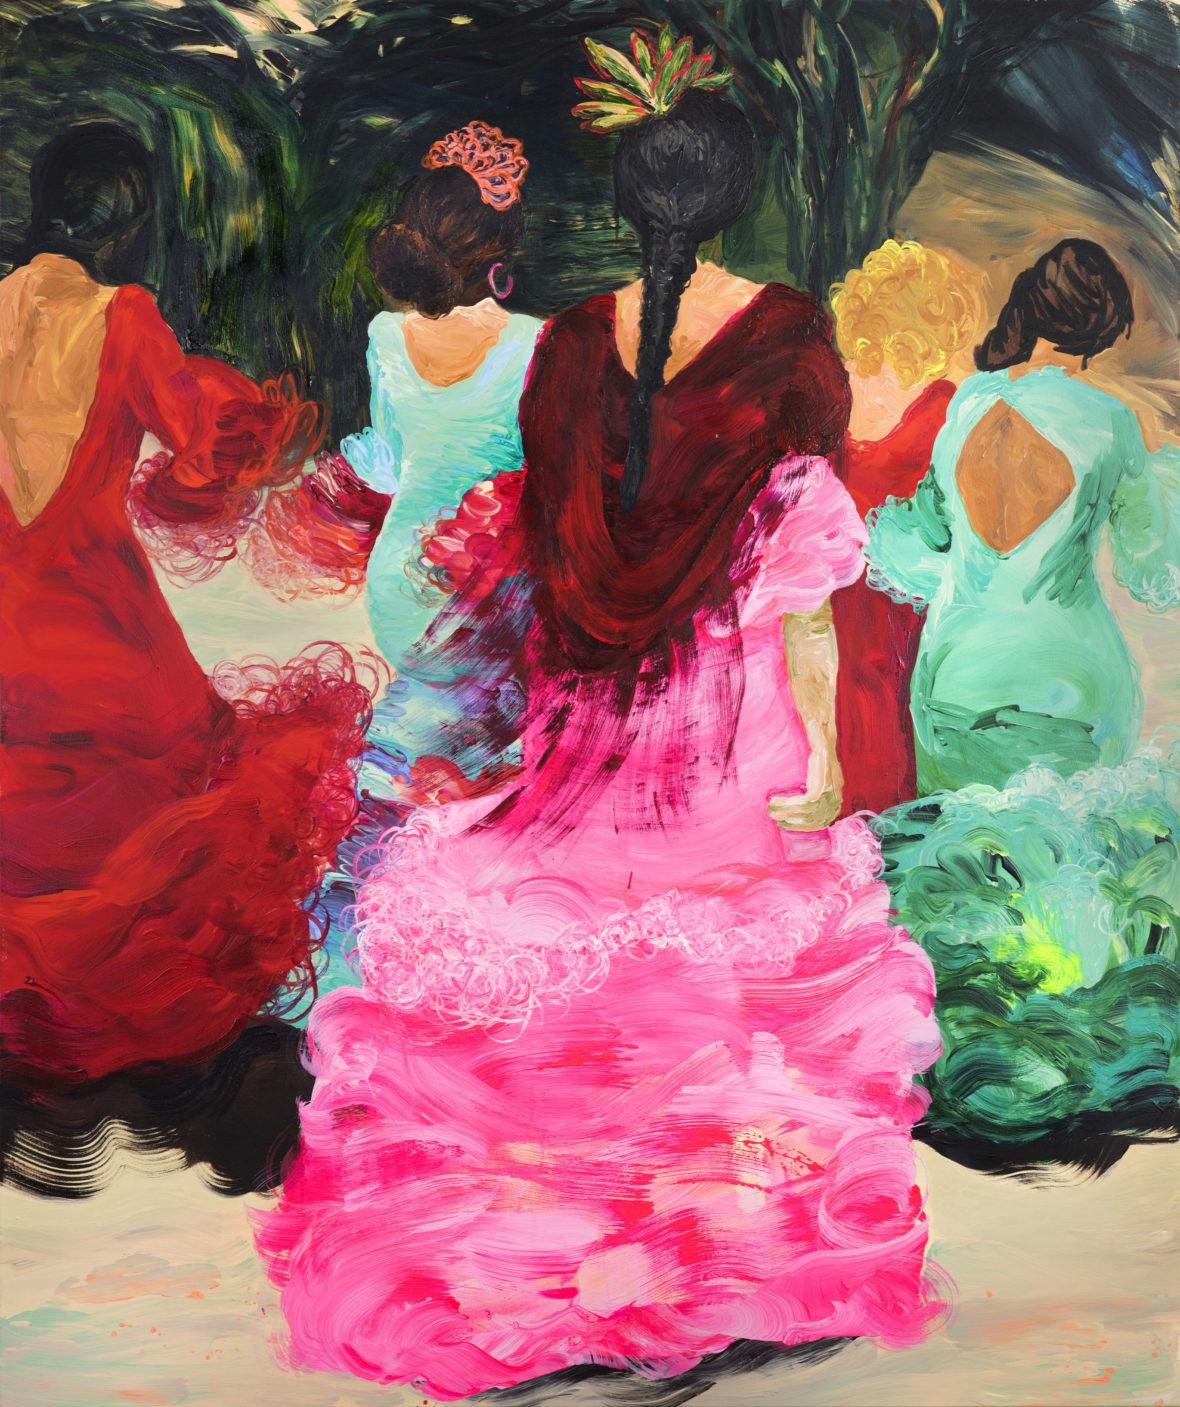 Flamencotanssijat älypuhelimien kanssa / Traditional dancers with smartphones